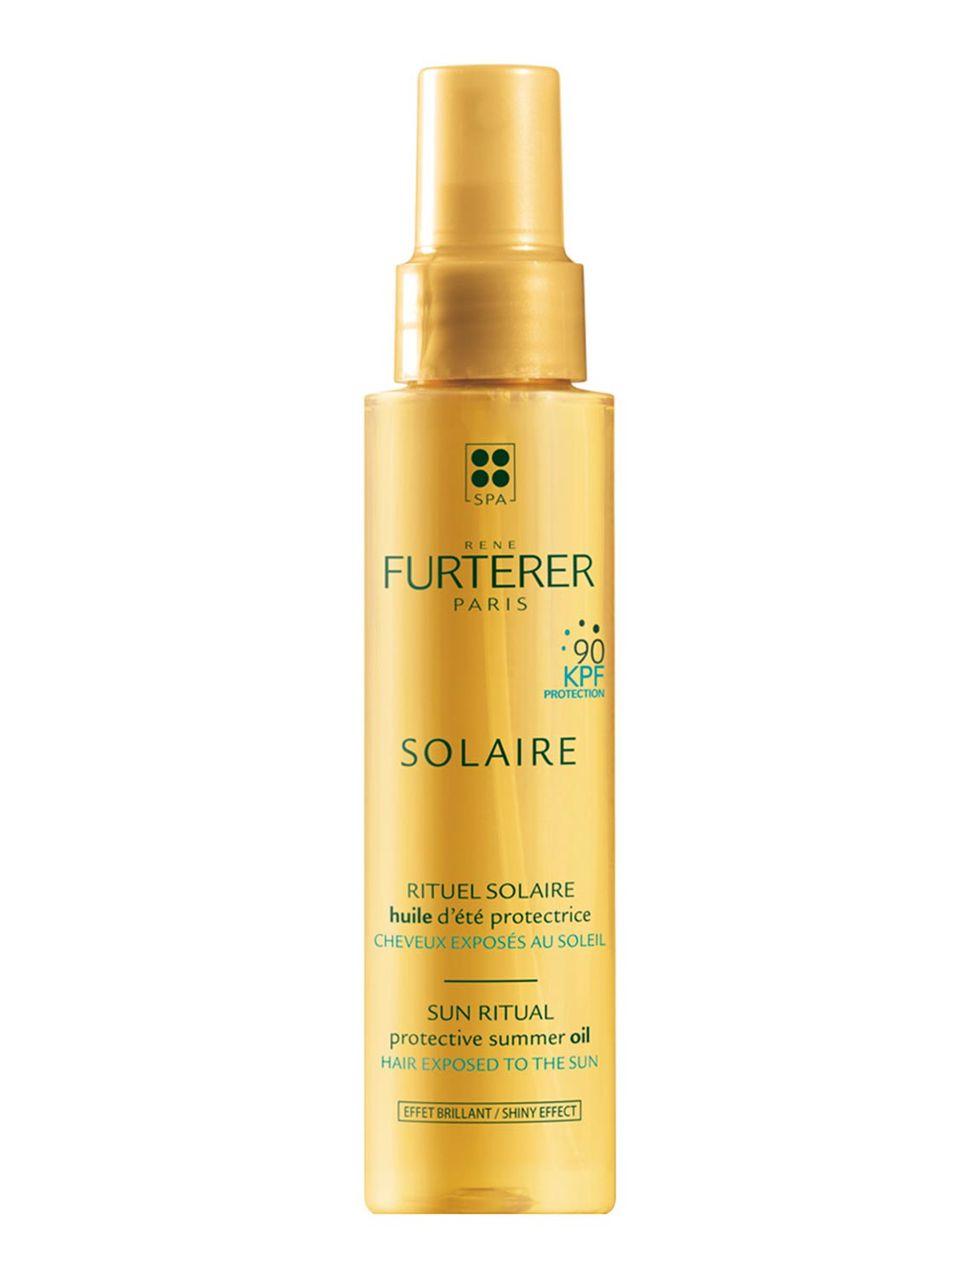 Protector solar de la marca Solaire, se encarga de proteger e hidratar el cabello.